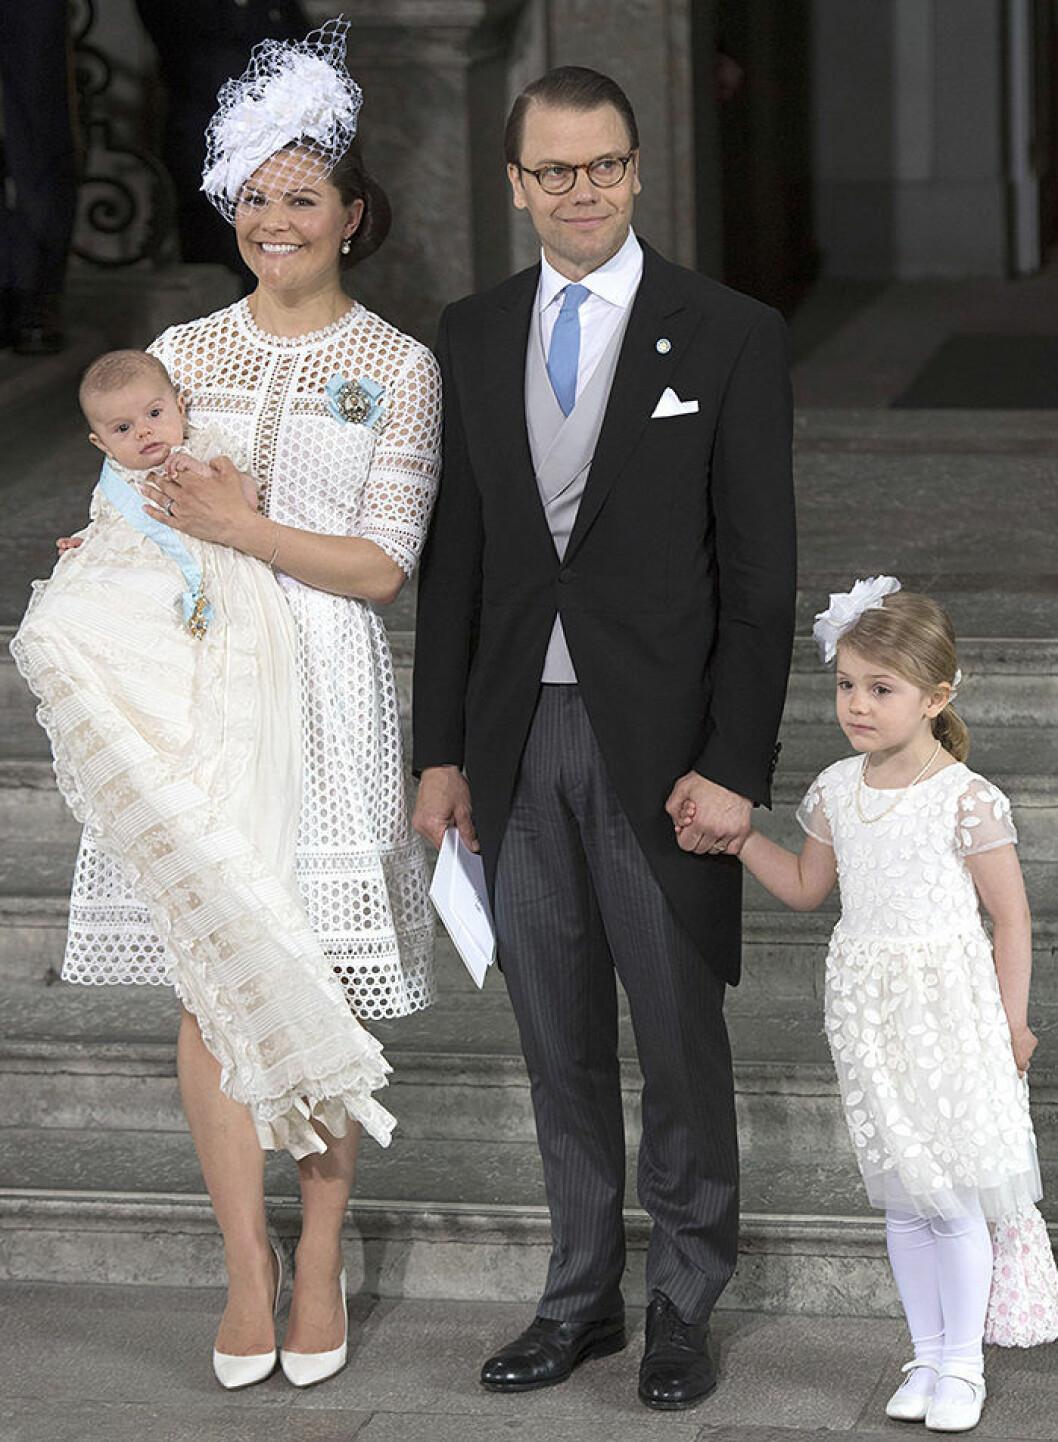 Crown Princess Victoria, Prince Daniel and Prince Oscar of Sweden Princess Estelle, Duchess of Östergötland